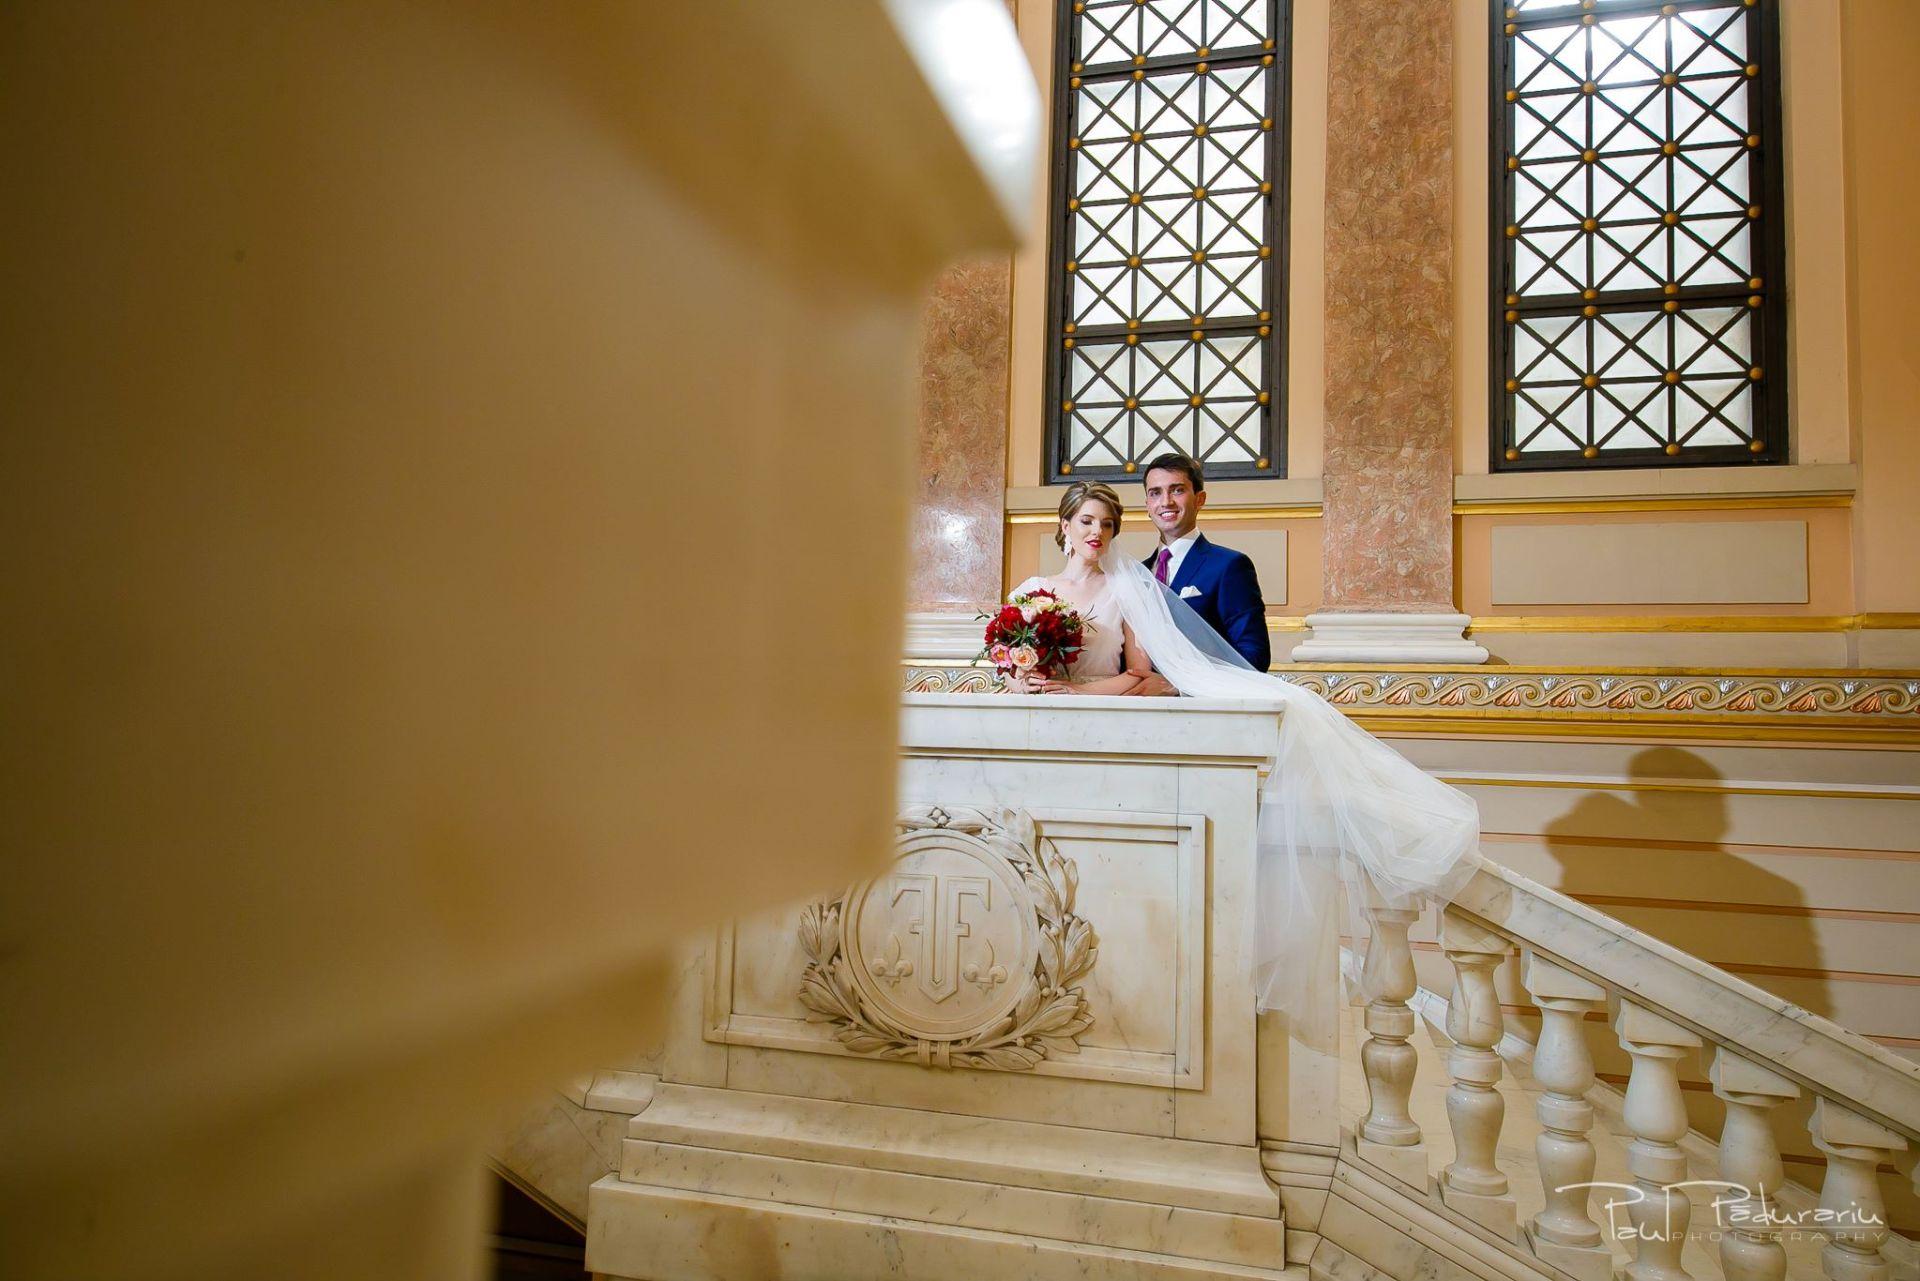 Madalina si Ionut - nunta Congress Hall | fotograf nunta iasi paul padurariu same day edit 2019 8